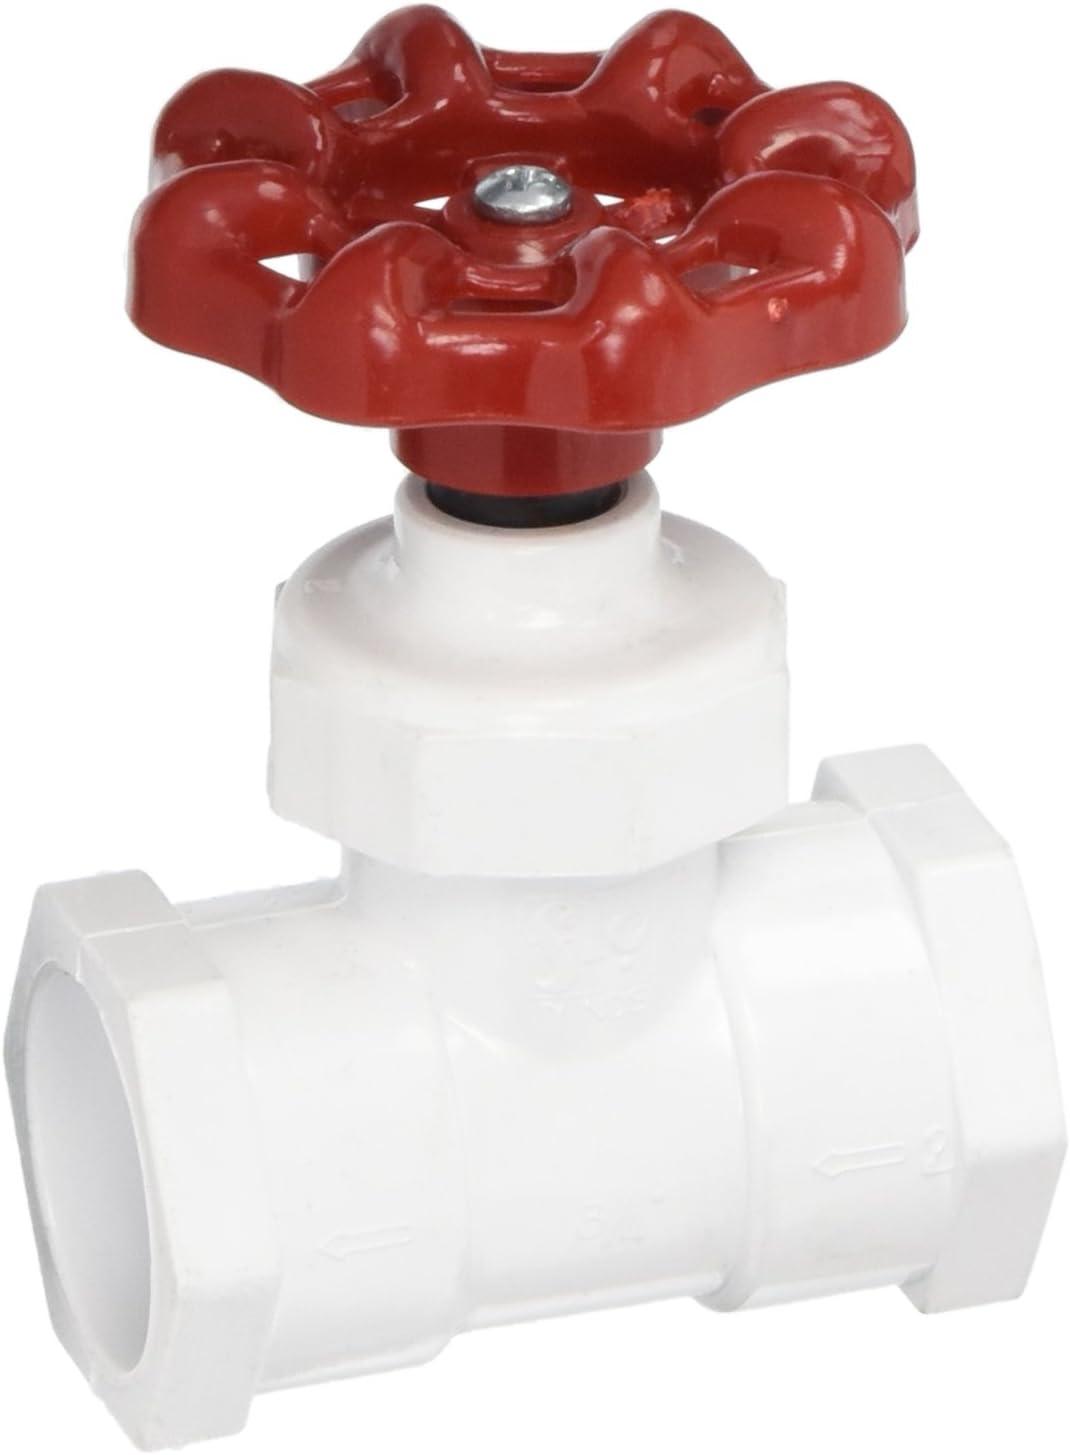 5 Pcs 3 Inch 75mm Fiber Polishing Buffing Wheel Sanding Disc 000-000-147 DIY NEW